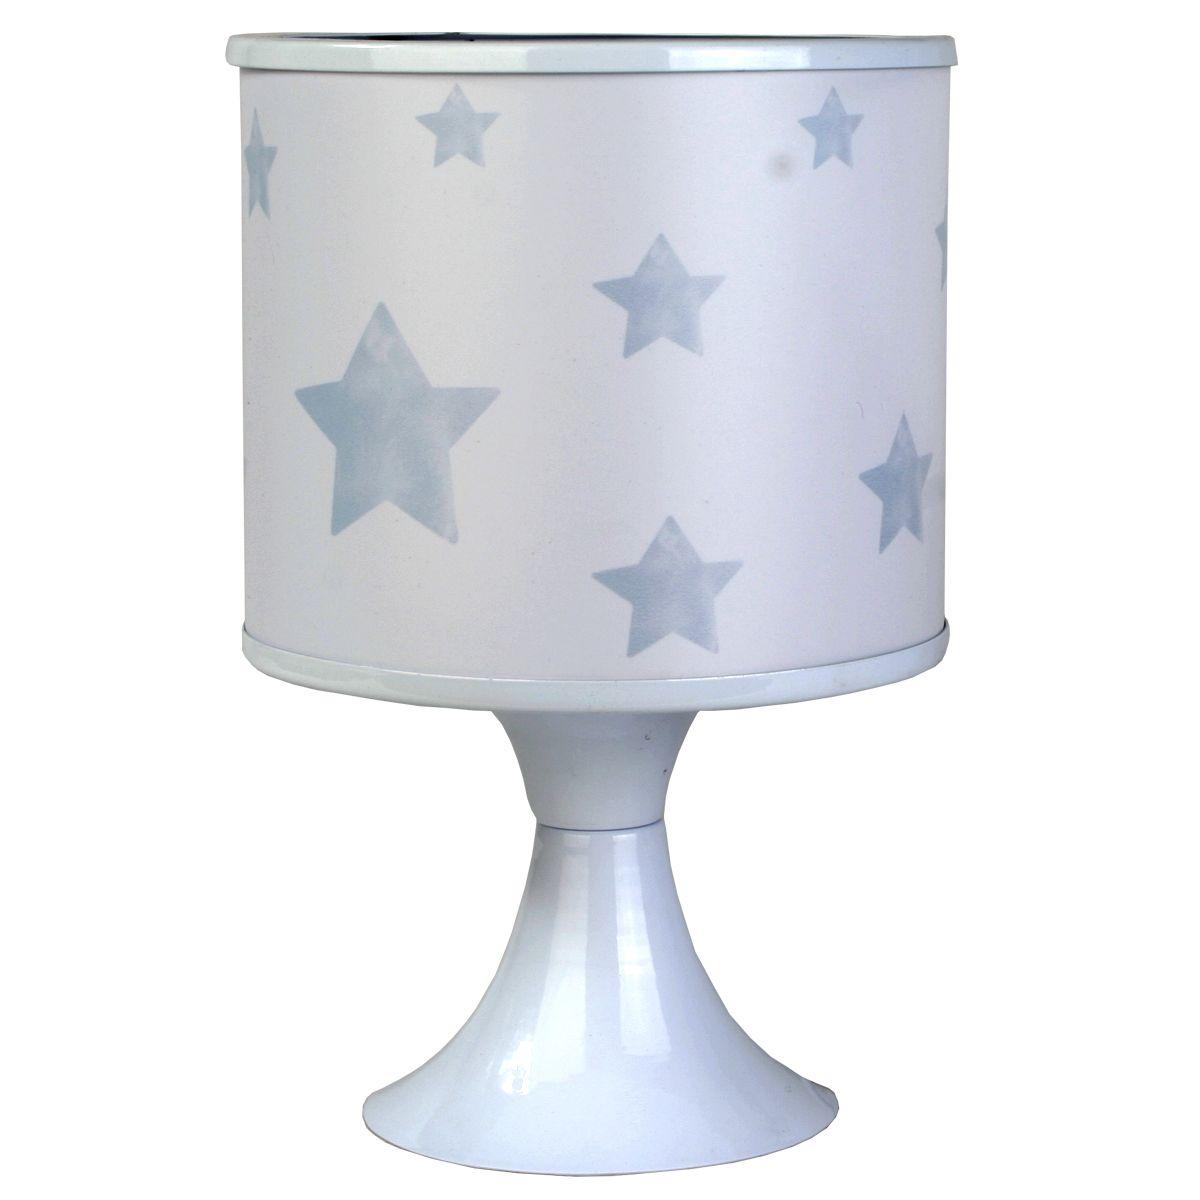 چراغ خواب کودک طرح ستاره کد57